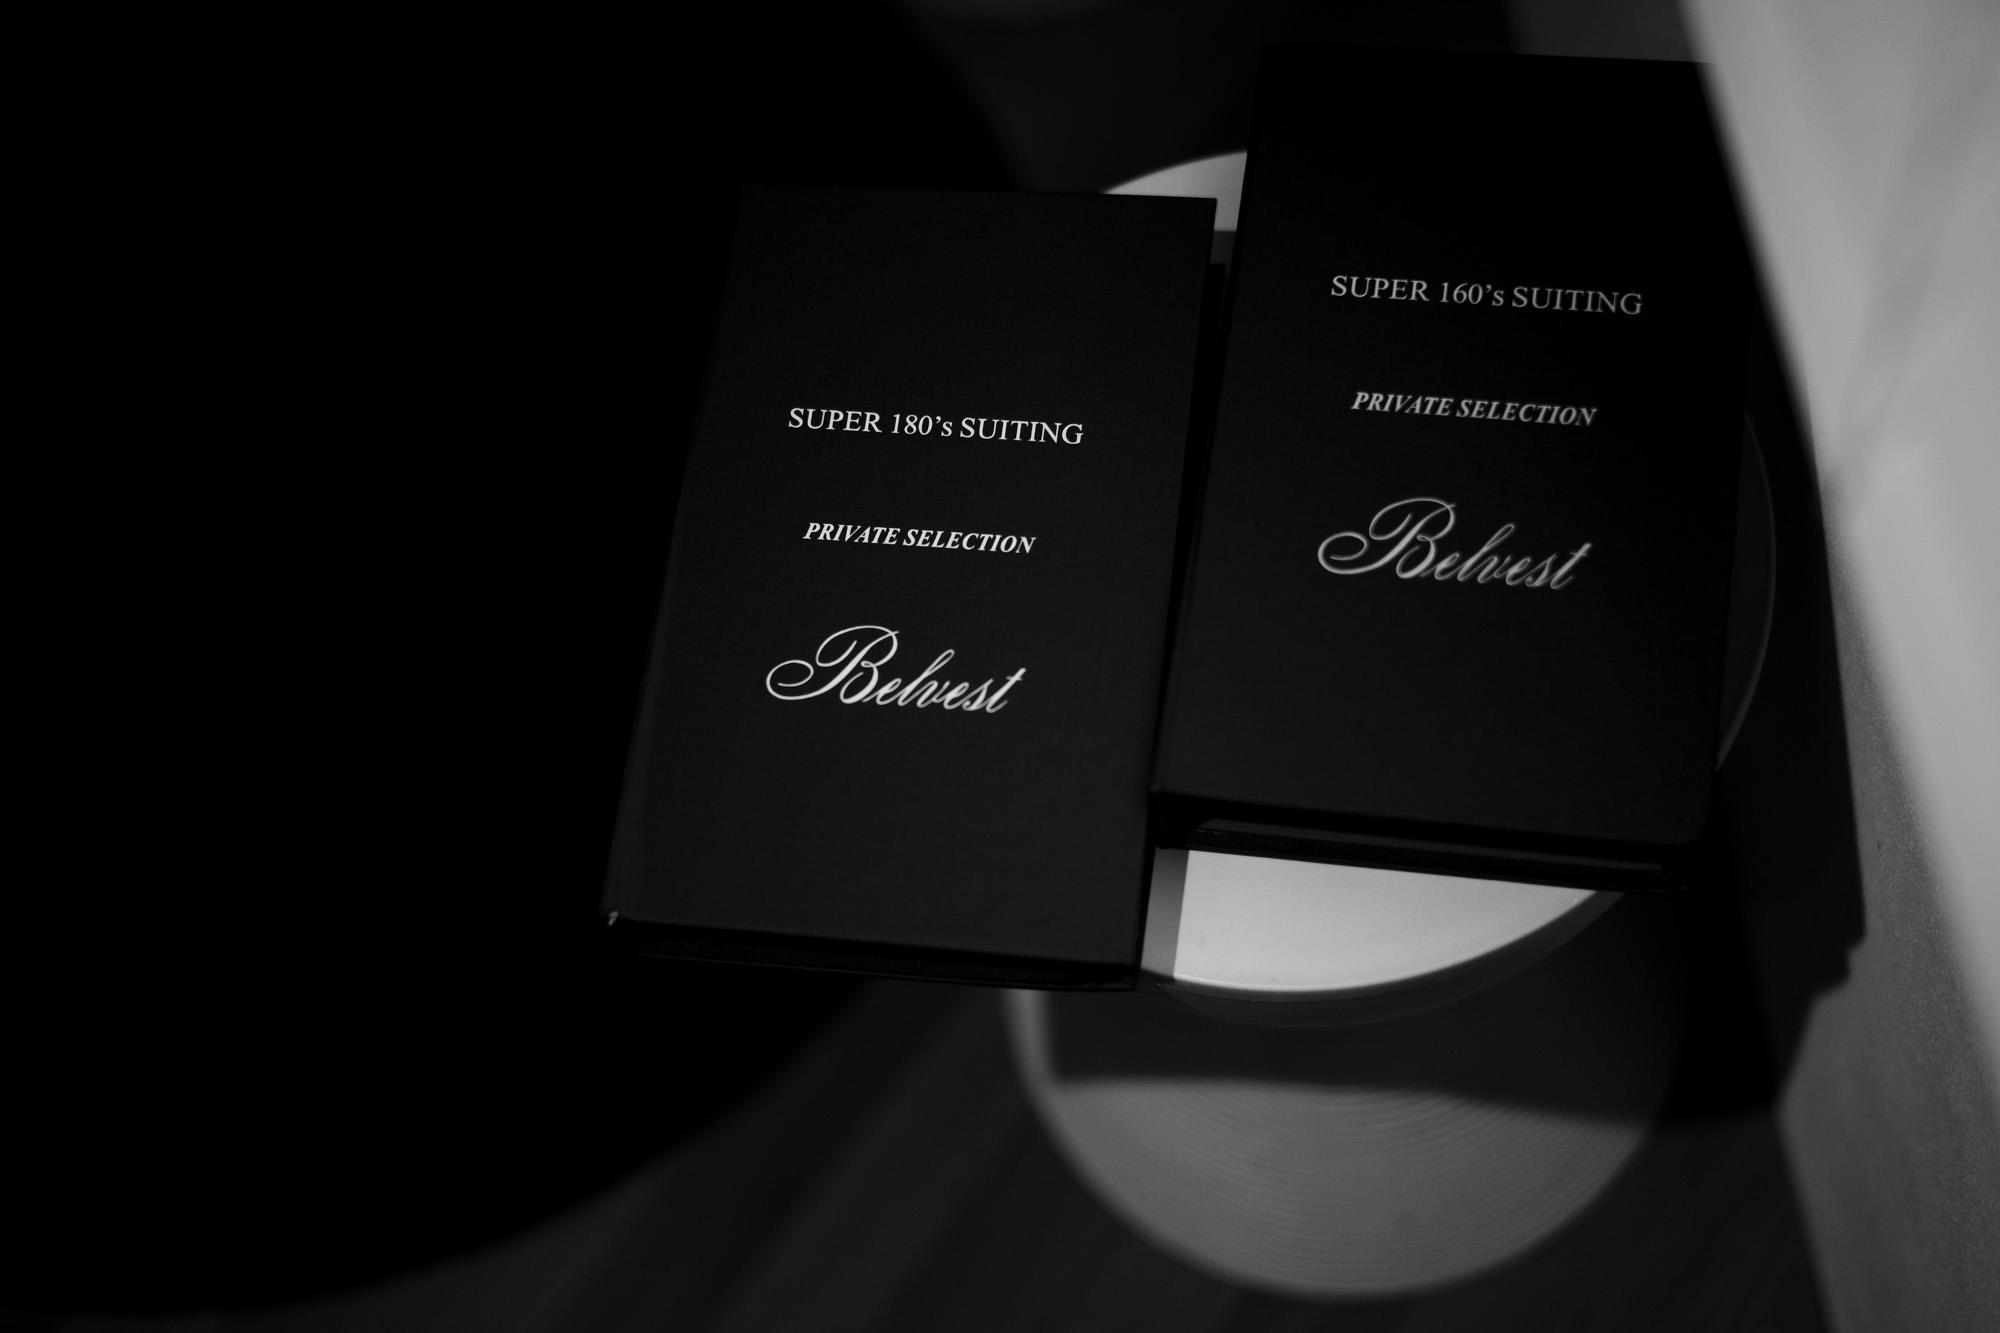 Belvest SUPER 180's , SUPER 160's 【Special Model】 ベルベスト スーツ ジャケット オーダー会 受注会 スーパー180 スーパー160 カシミヤ カシミヤジャケット 愛知 名古屋 Alto e Diritto altoediritto アルトエデリット